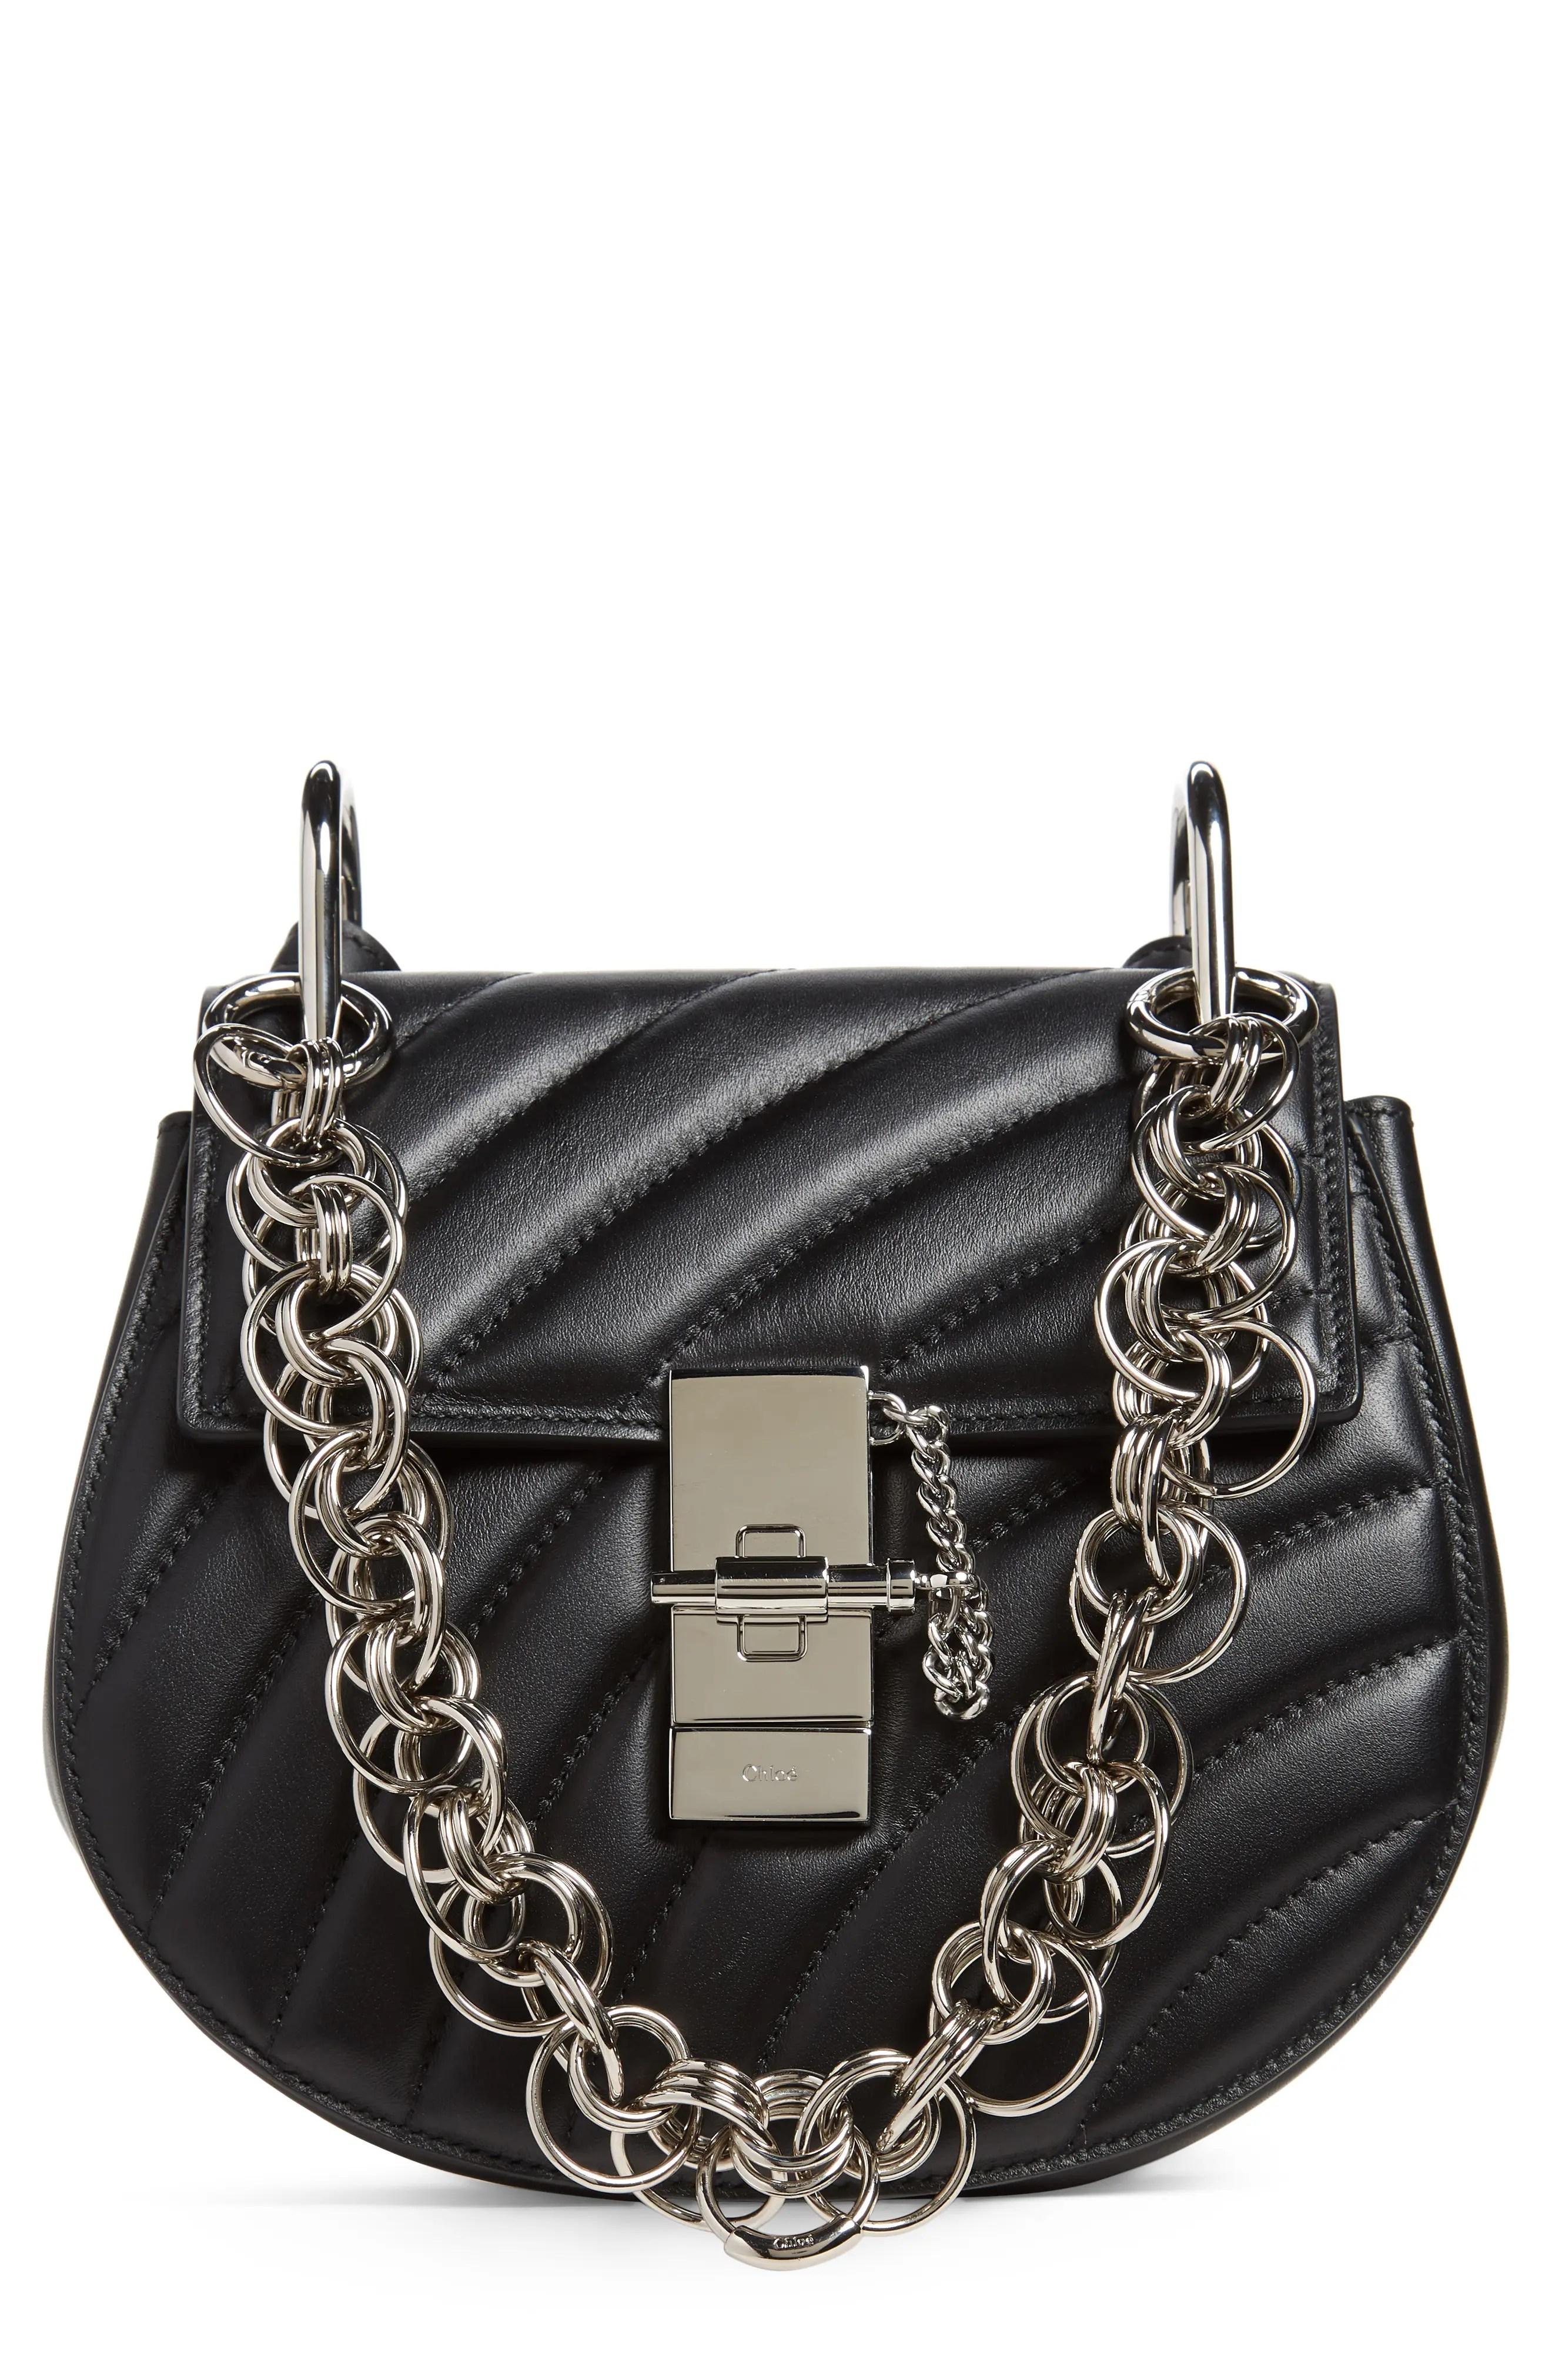 Well-Educated Fashion Newspaper Print Design Women Casual Envelope Bag Day Clutches Chain Purse Crossbody Messenger Bag Shoulder Bag Handbag Clutches